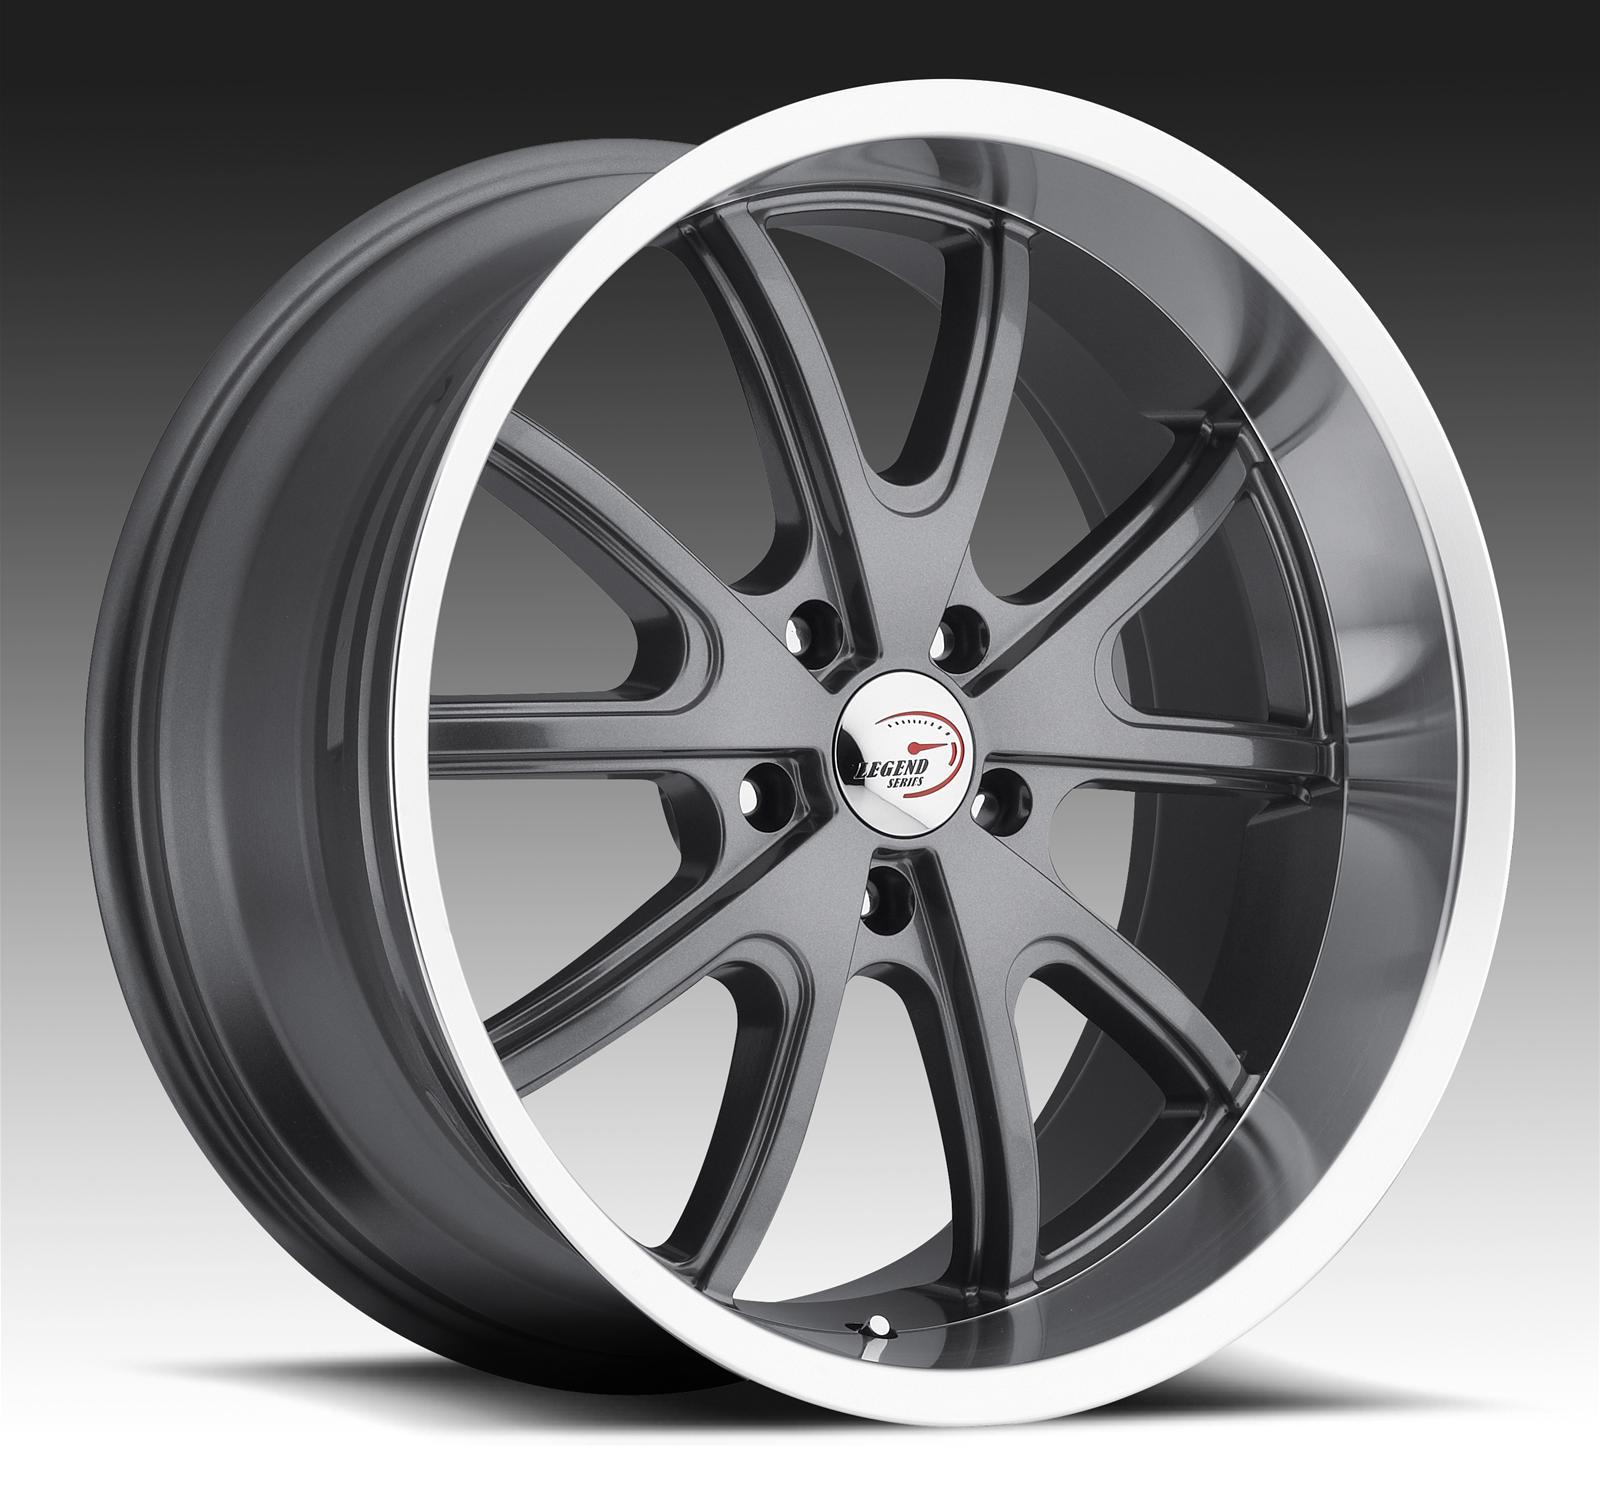 sum-1432812gmml3_xl Inspiring Tvr Griffith Wheel Nut torque Cars Trend